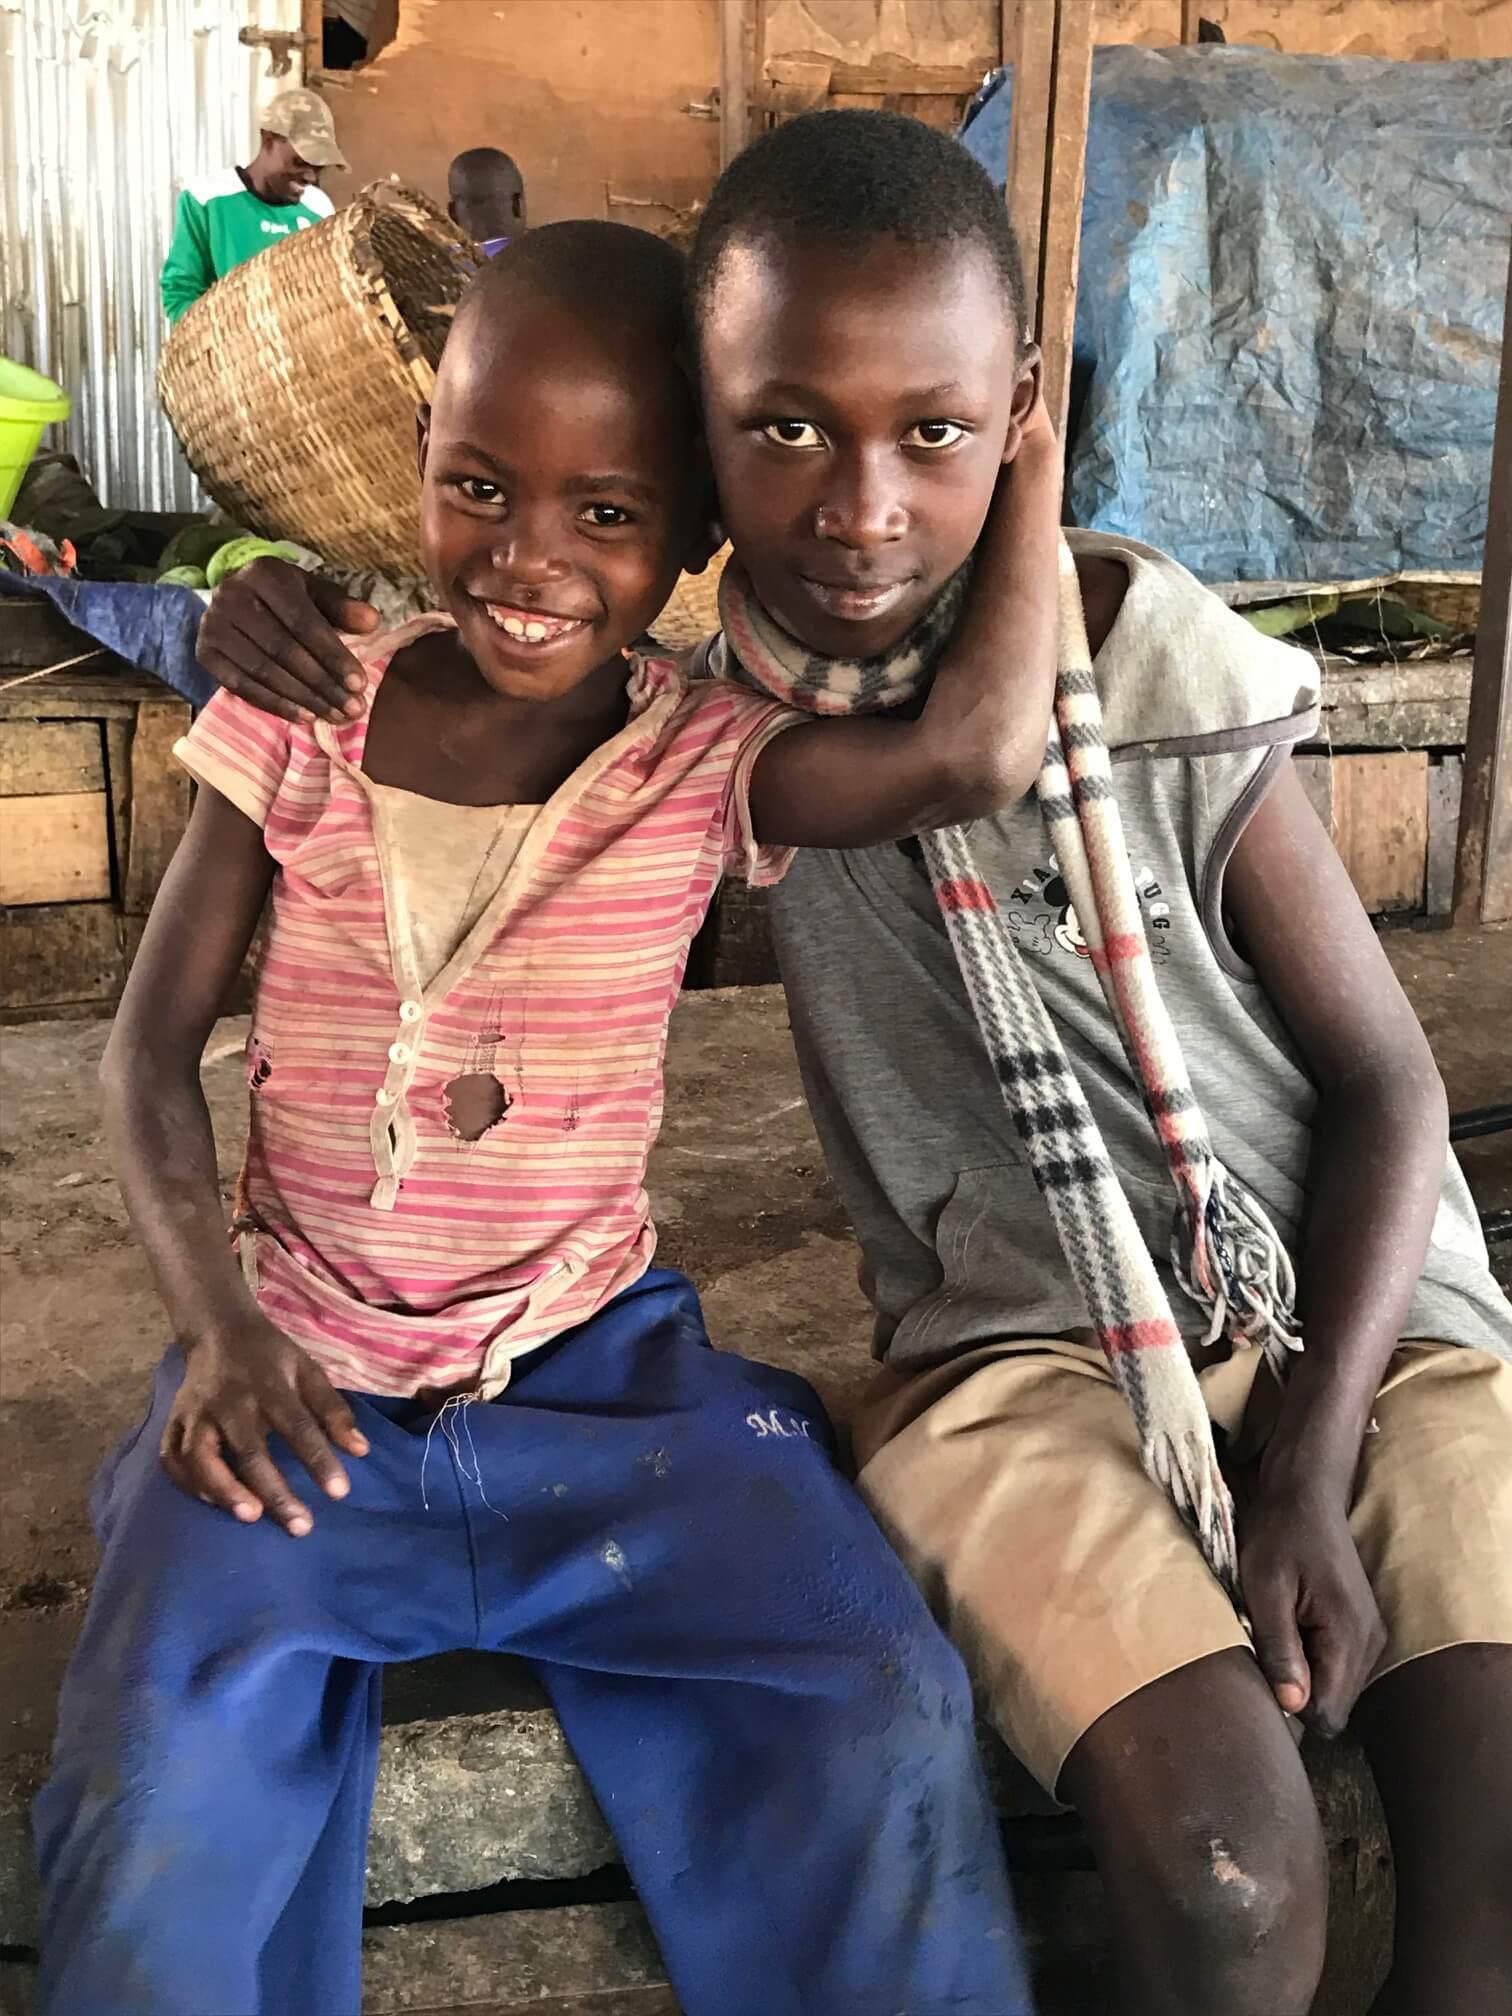 Two smiling Rwandan kids